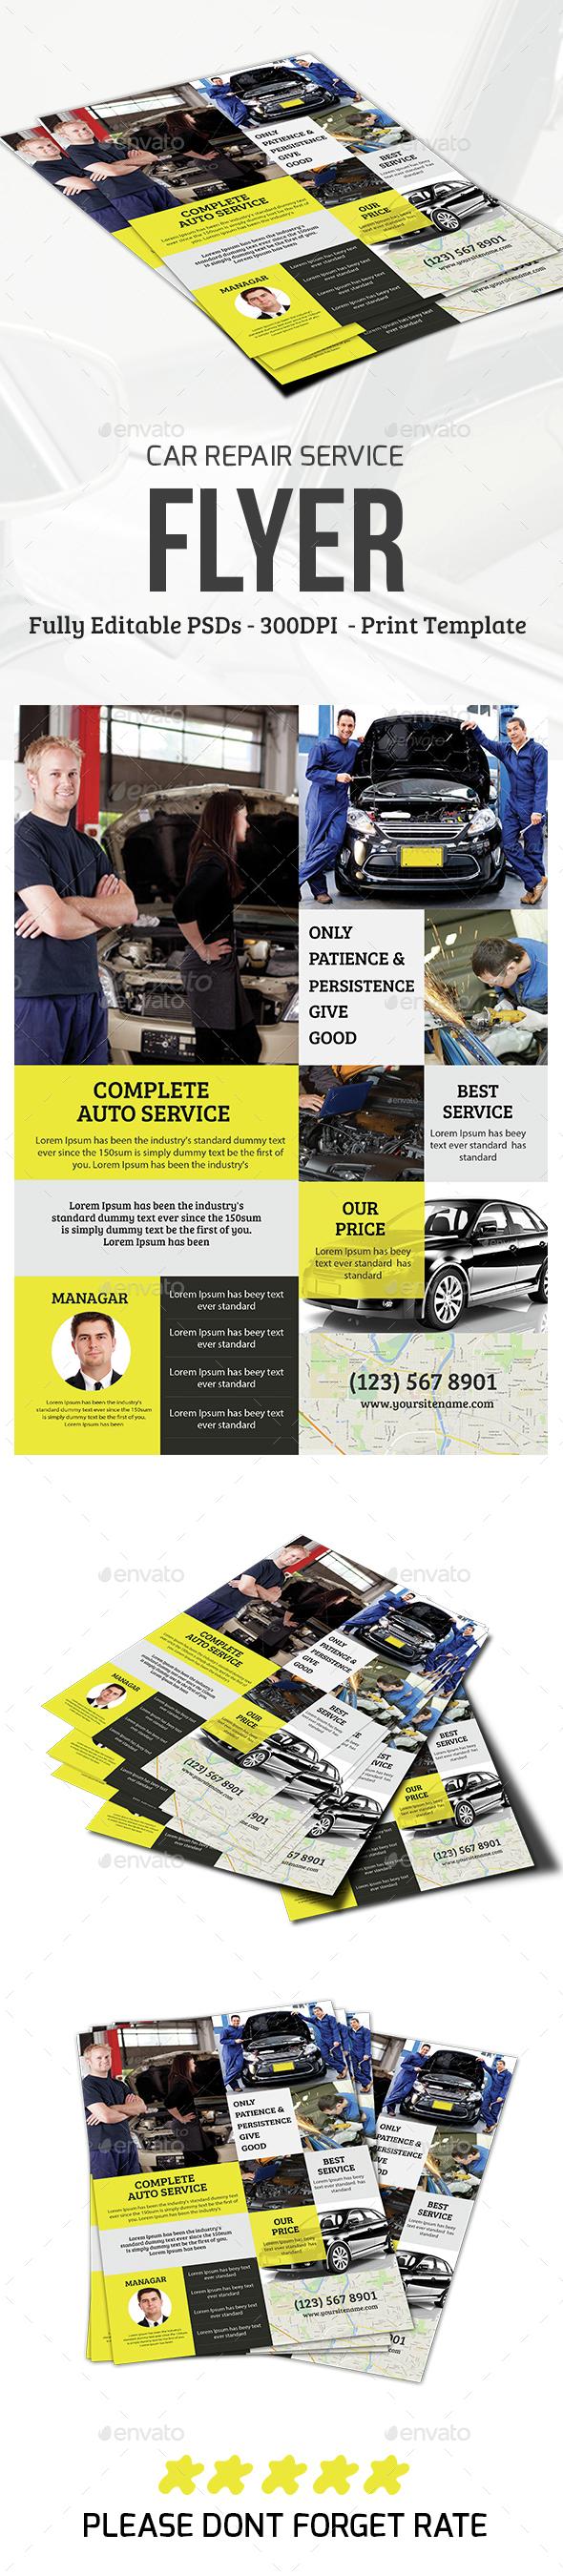 Car Repair Service Flyer - Commerce Flyers